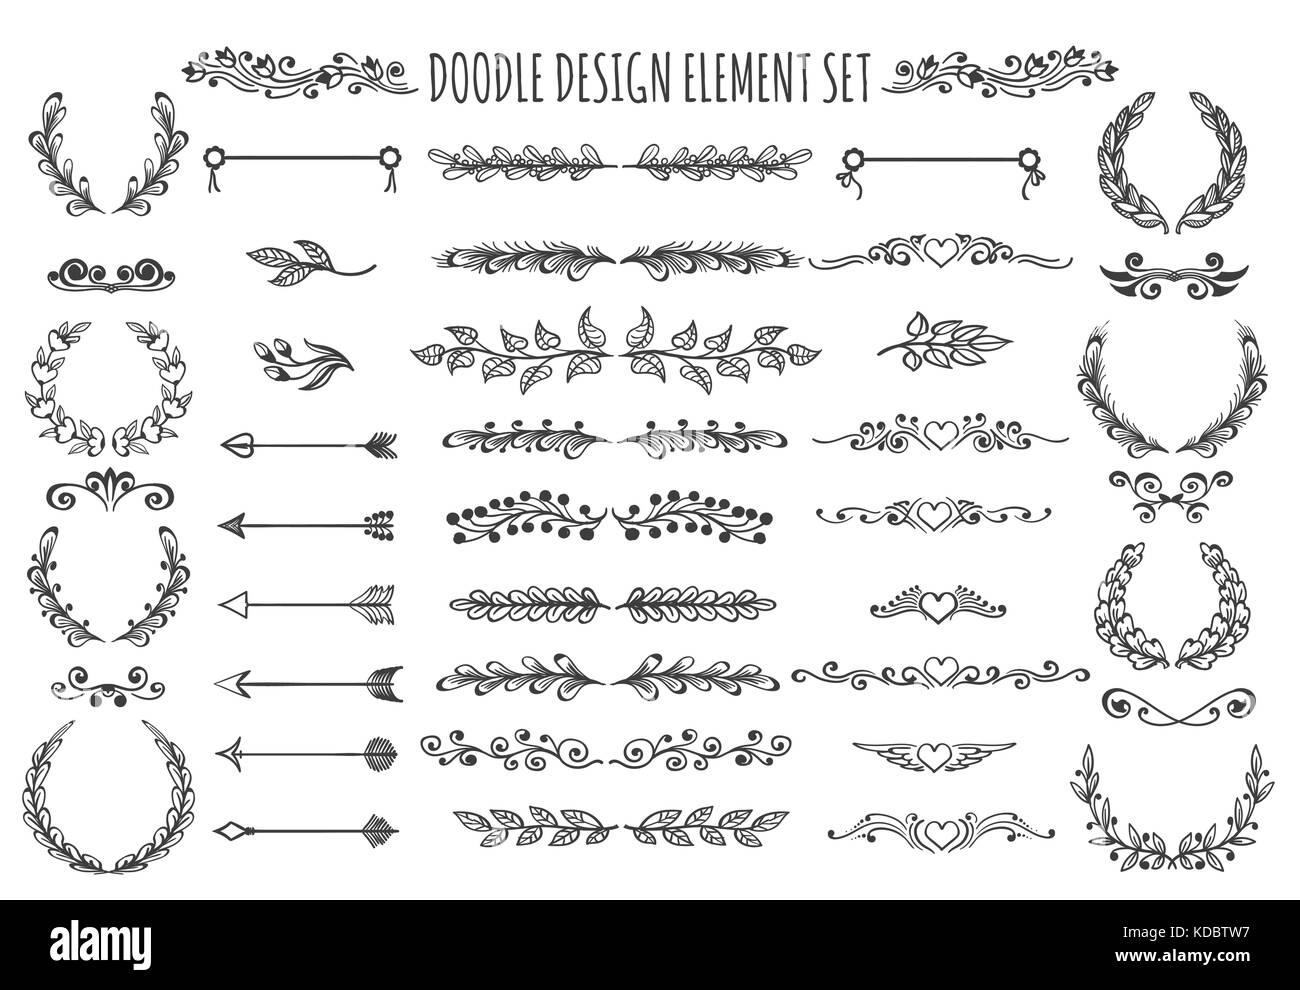 set of doodle design elements hand drawn arrows wreaths